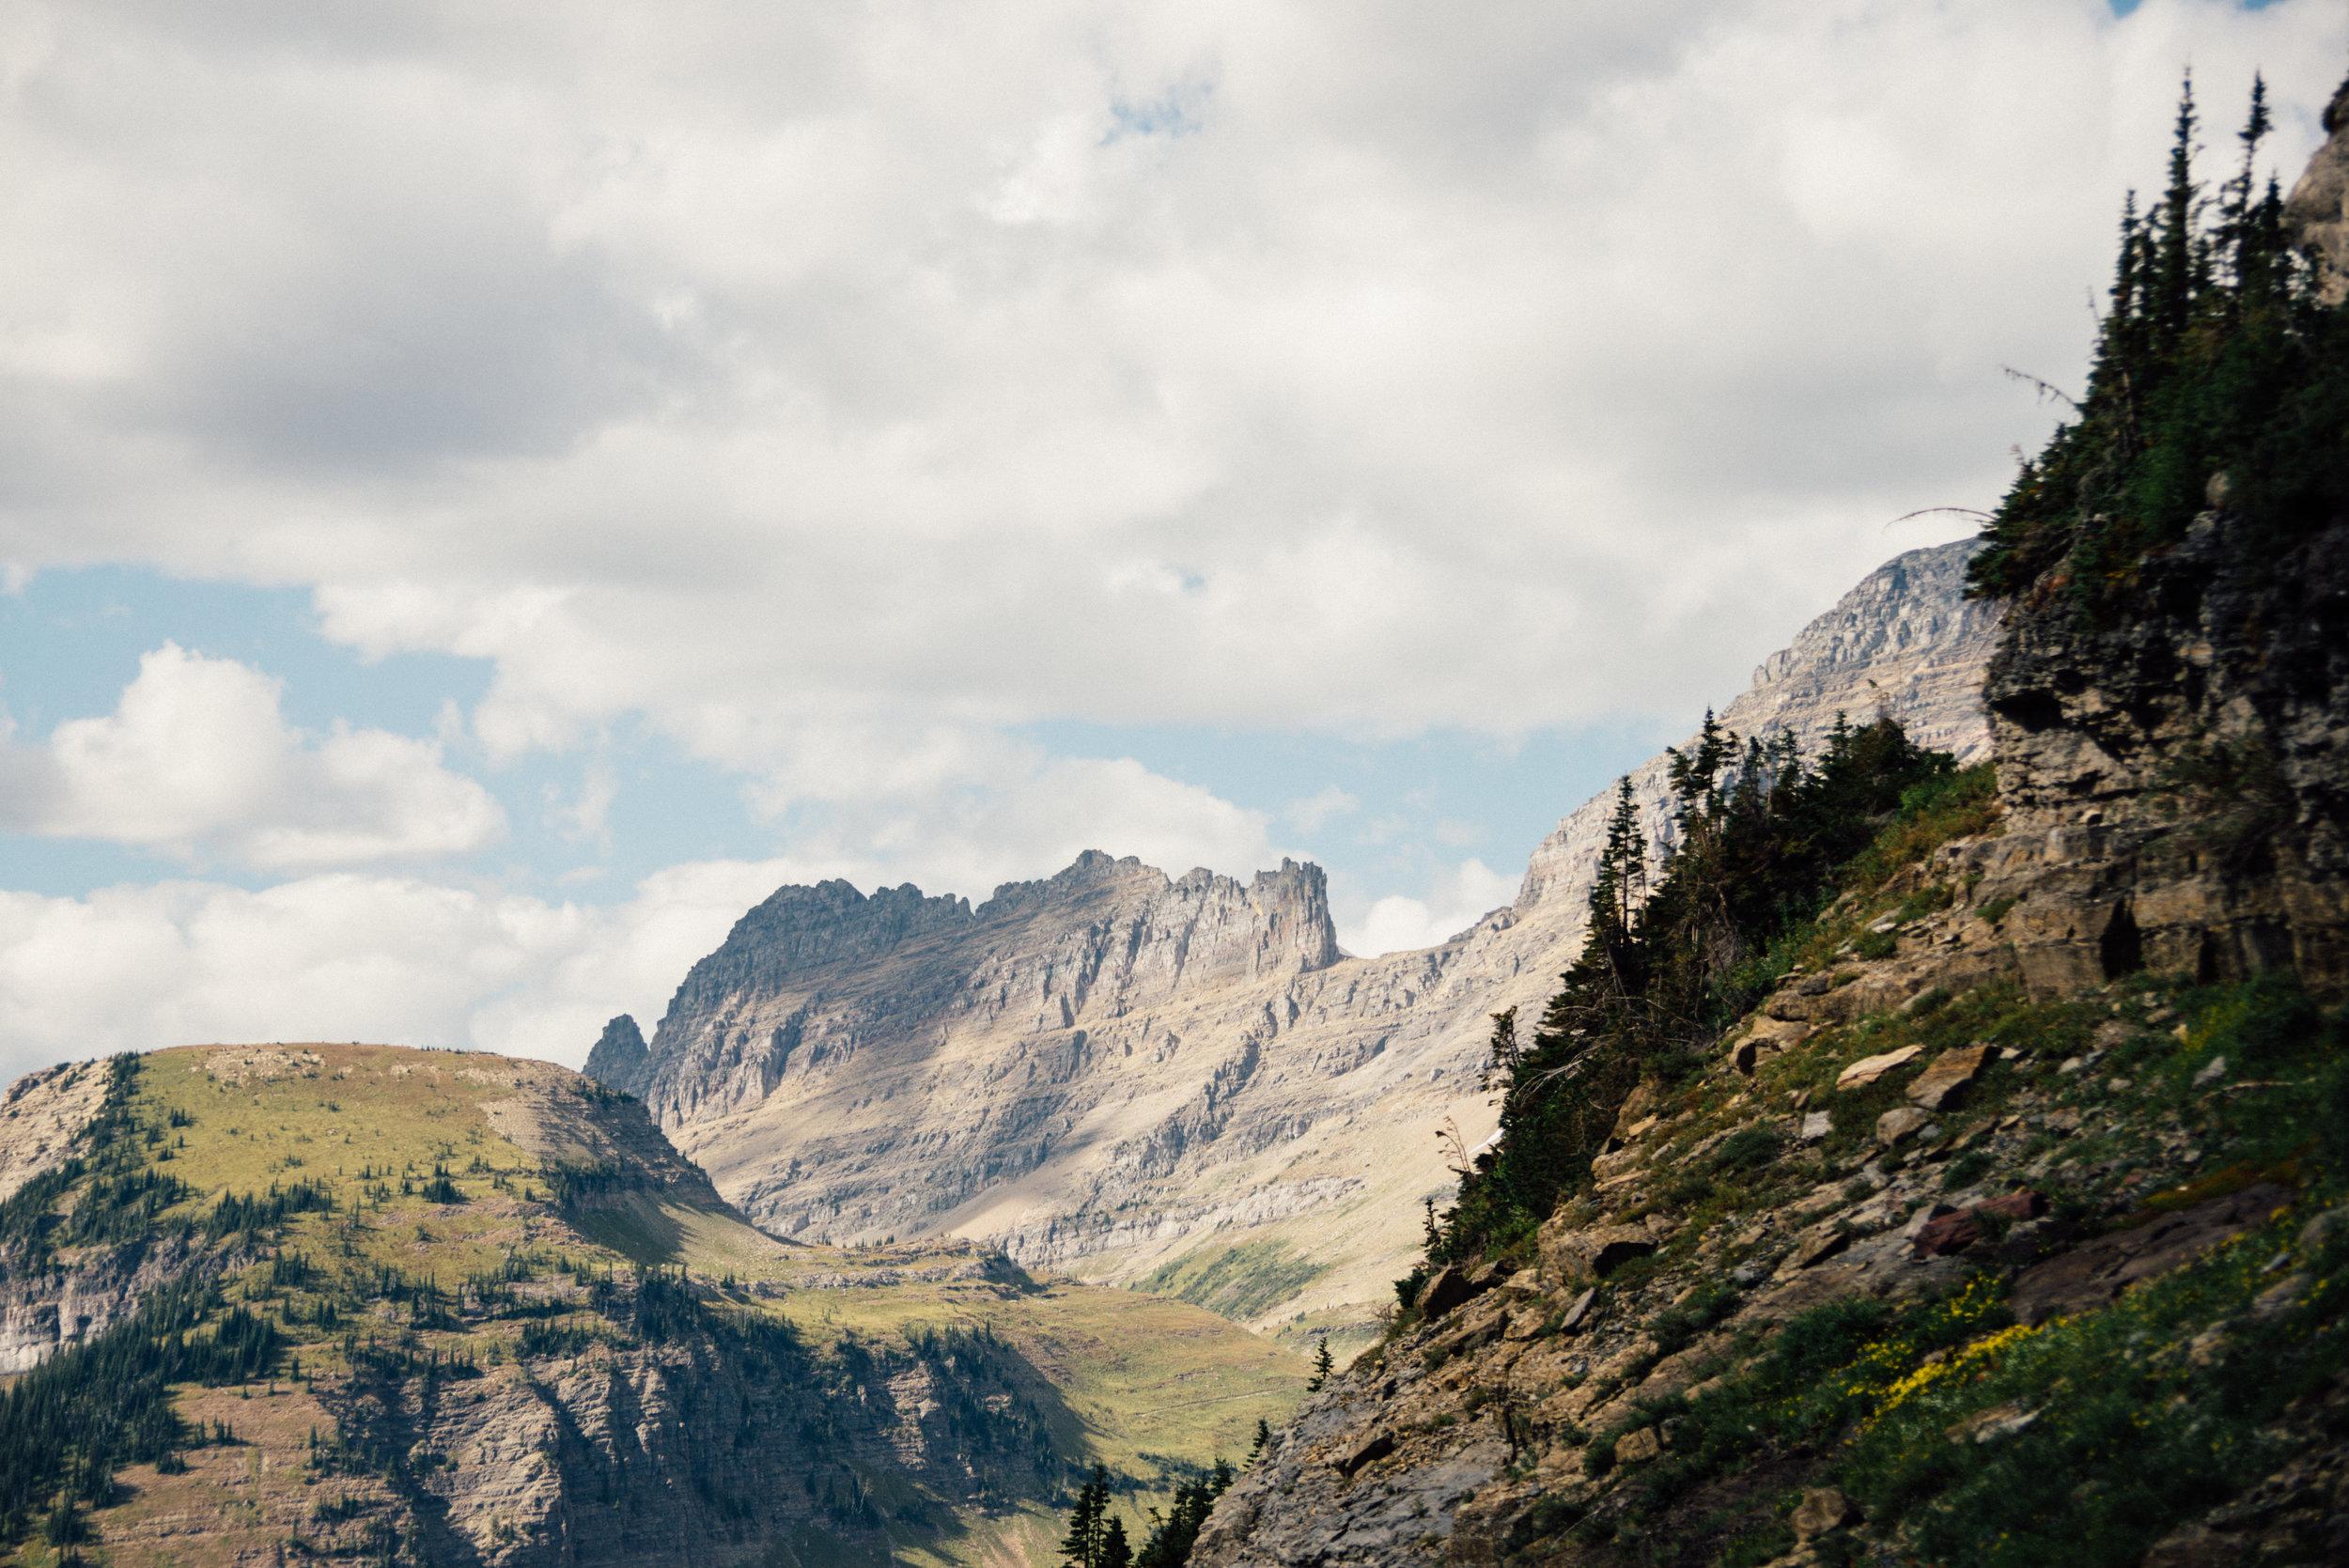 glacier_national_park_2.jpg